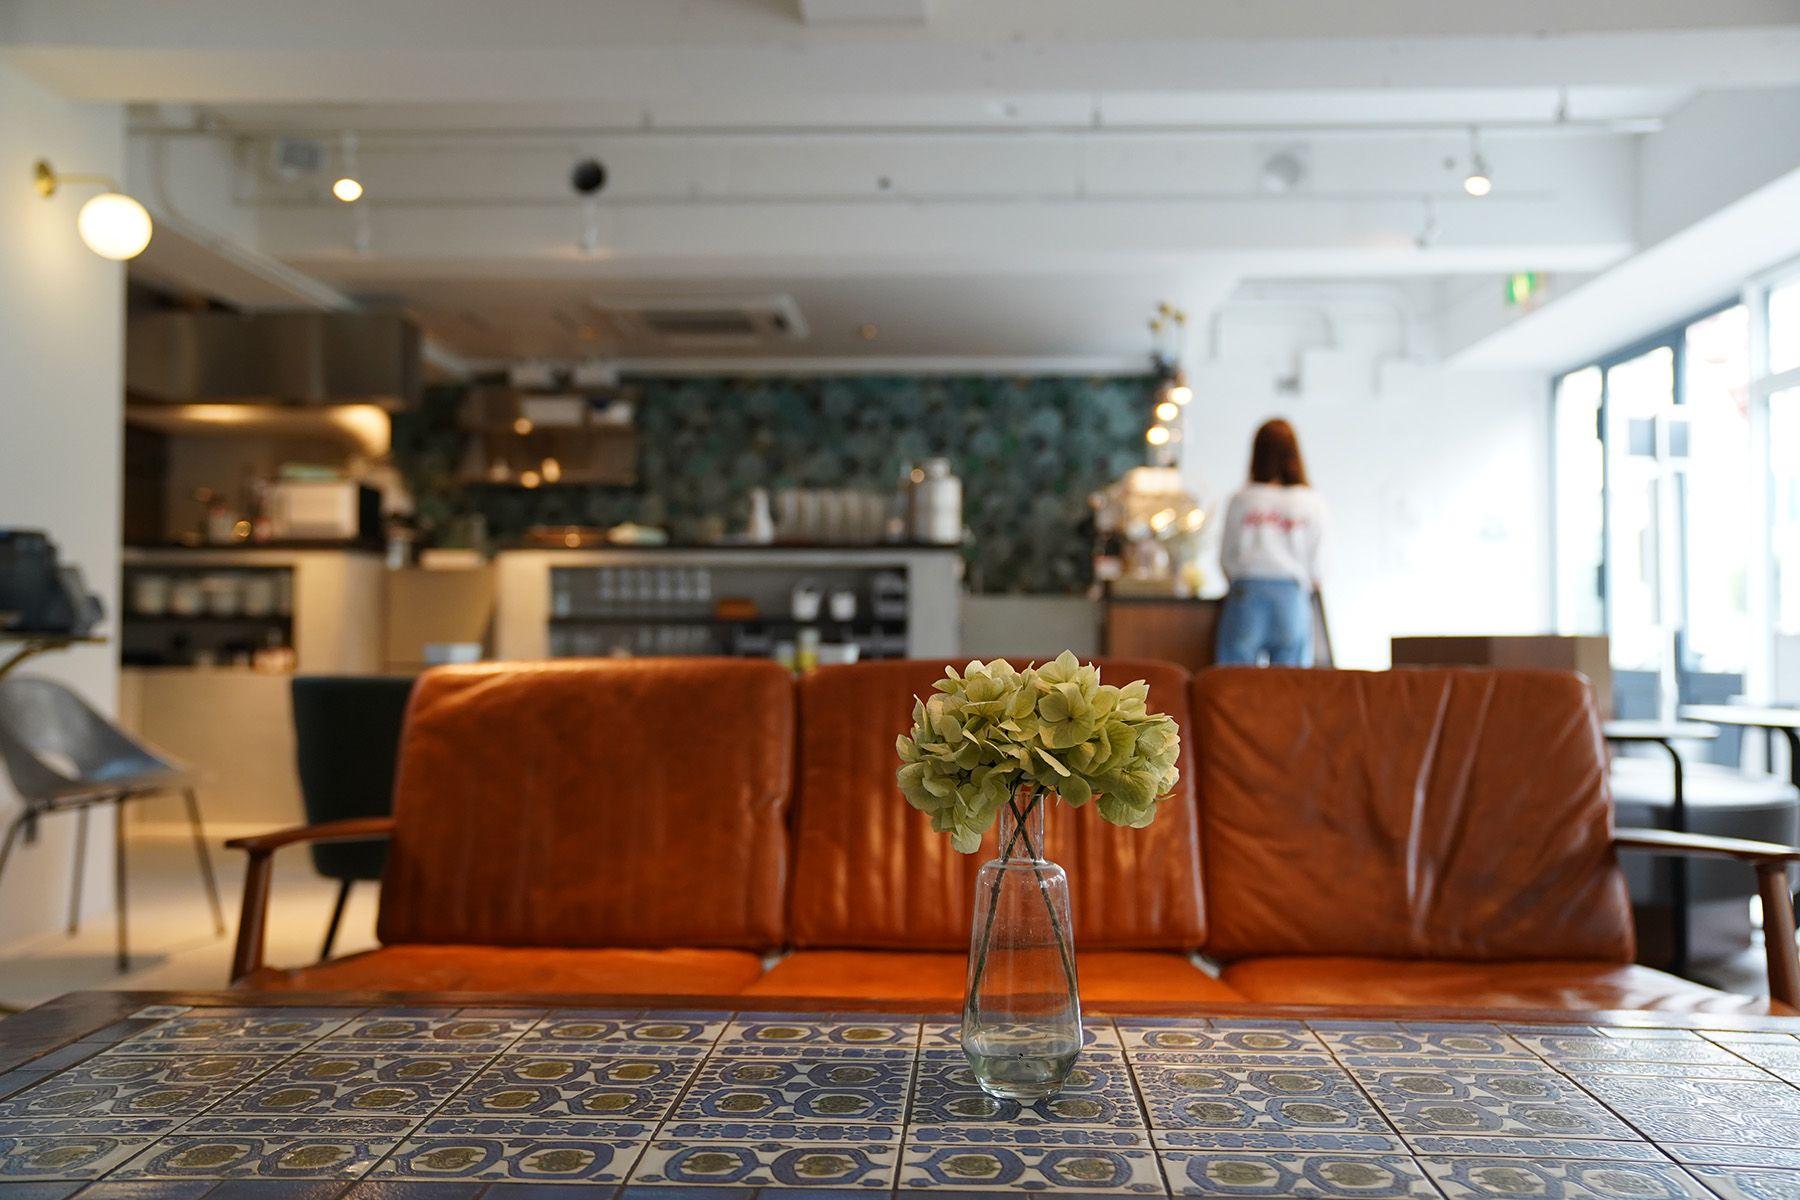 ANEA CAFÉ  松見坂/店舗 (アネアカフェ マツミザカ)3シータ 皮張りソファ